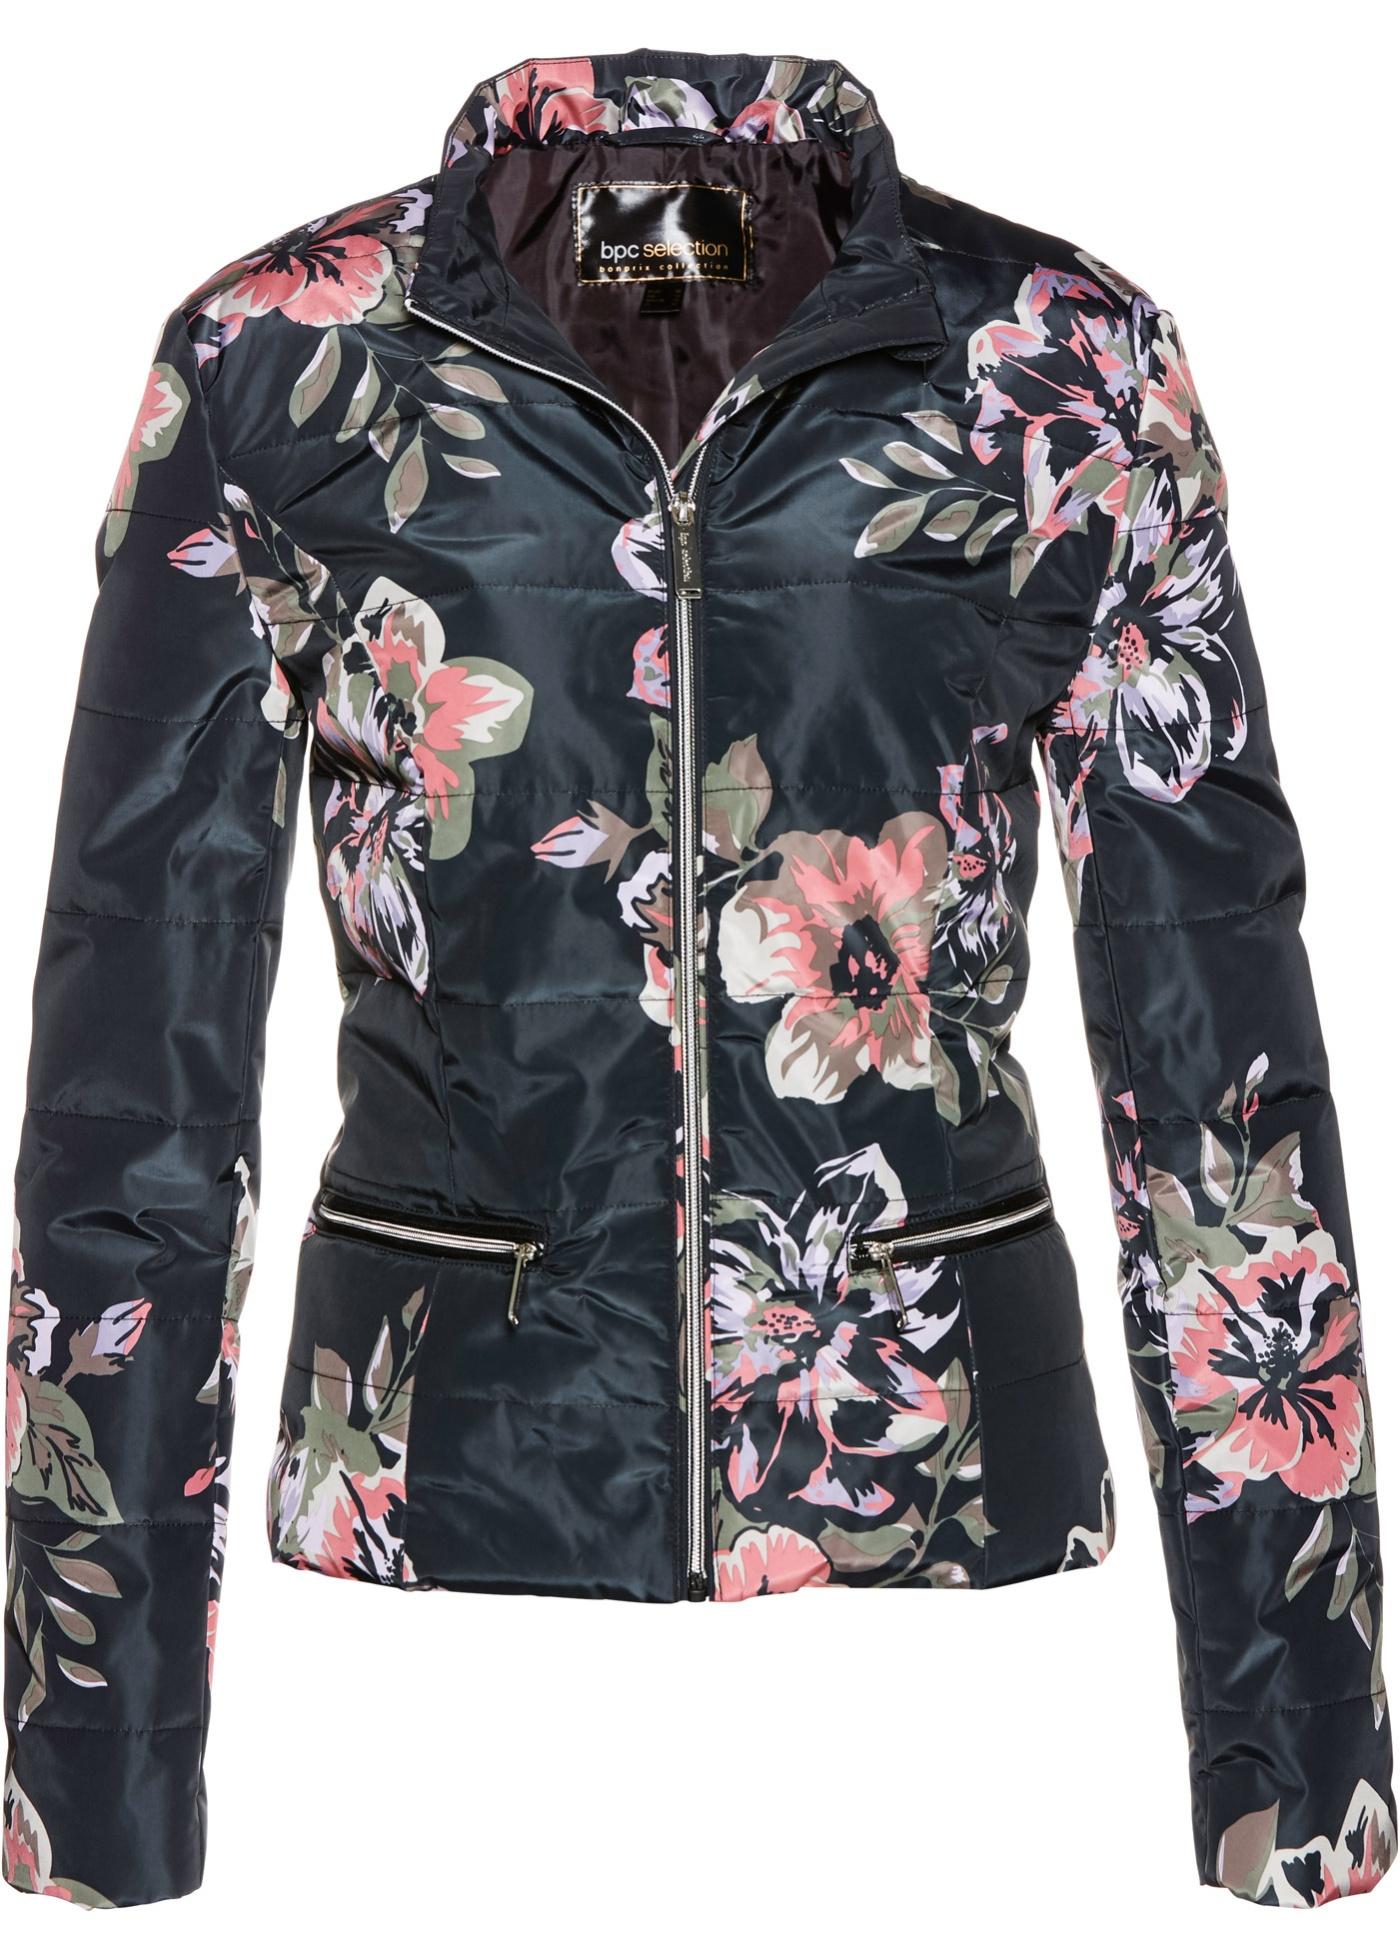 Bonprix SE - Quiltad jacka med blommönster 299.00